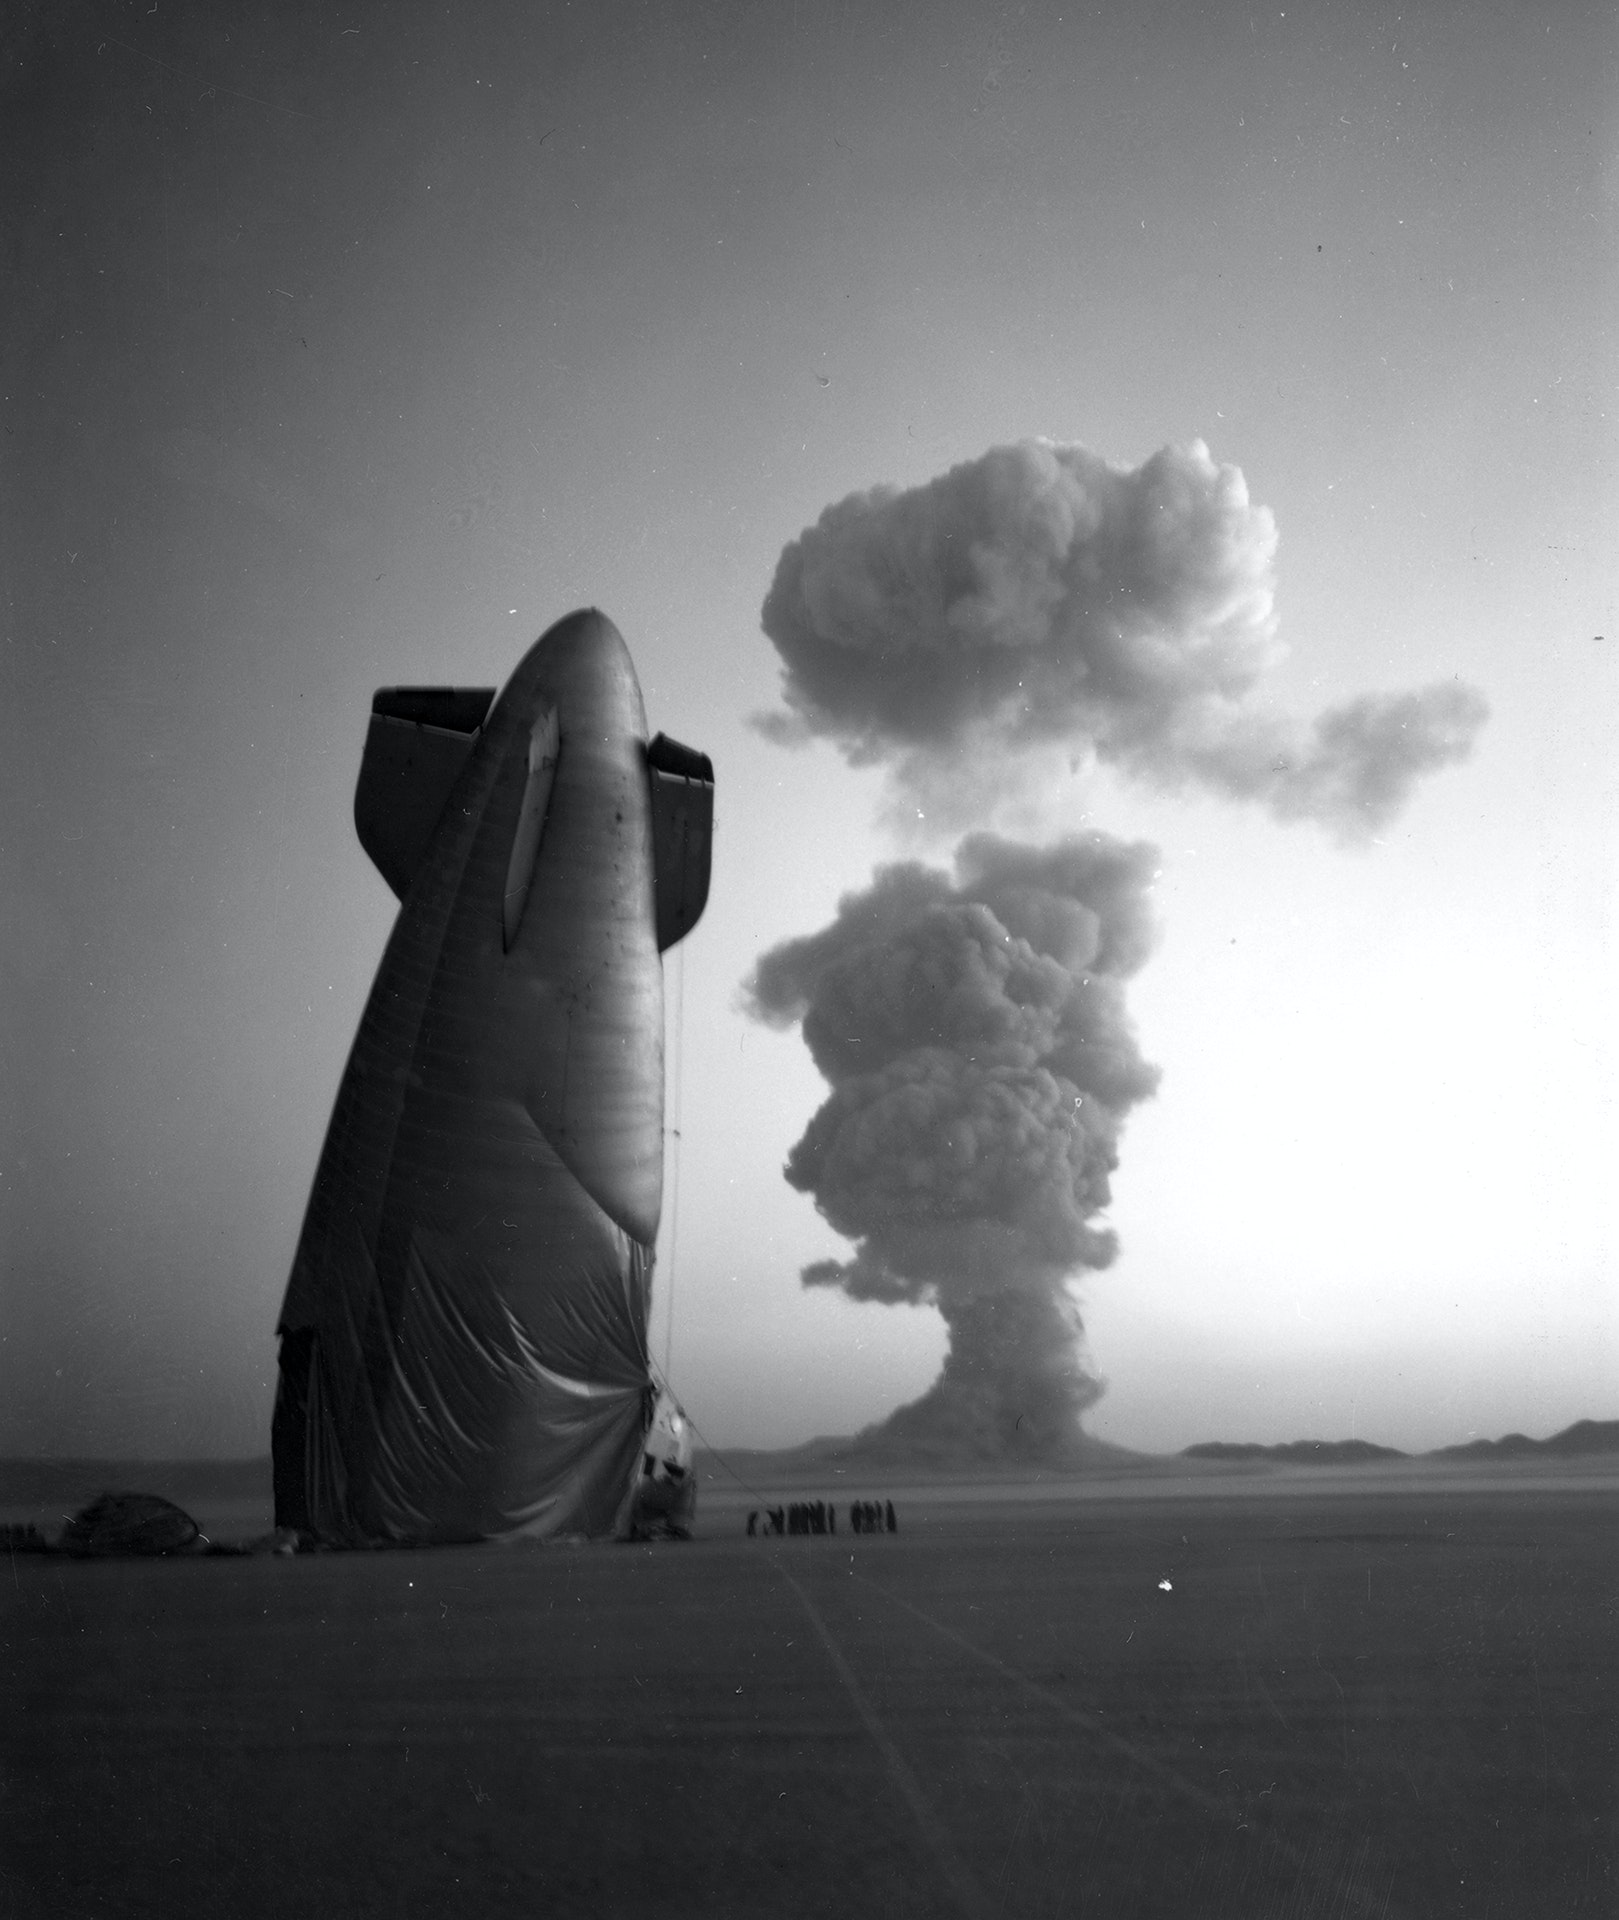 atomic-bomb_11